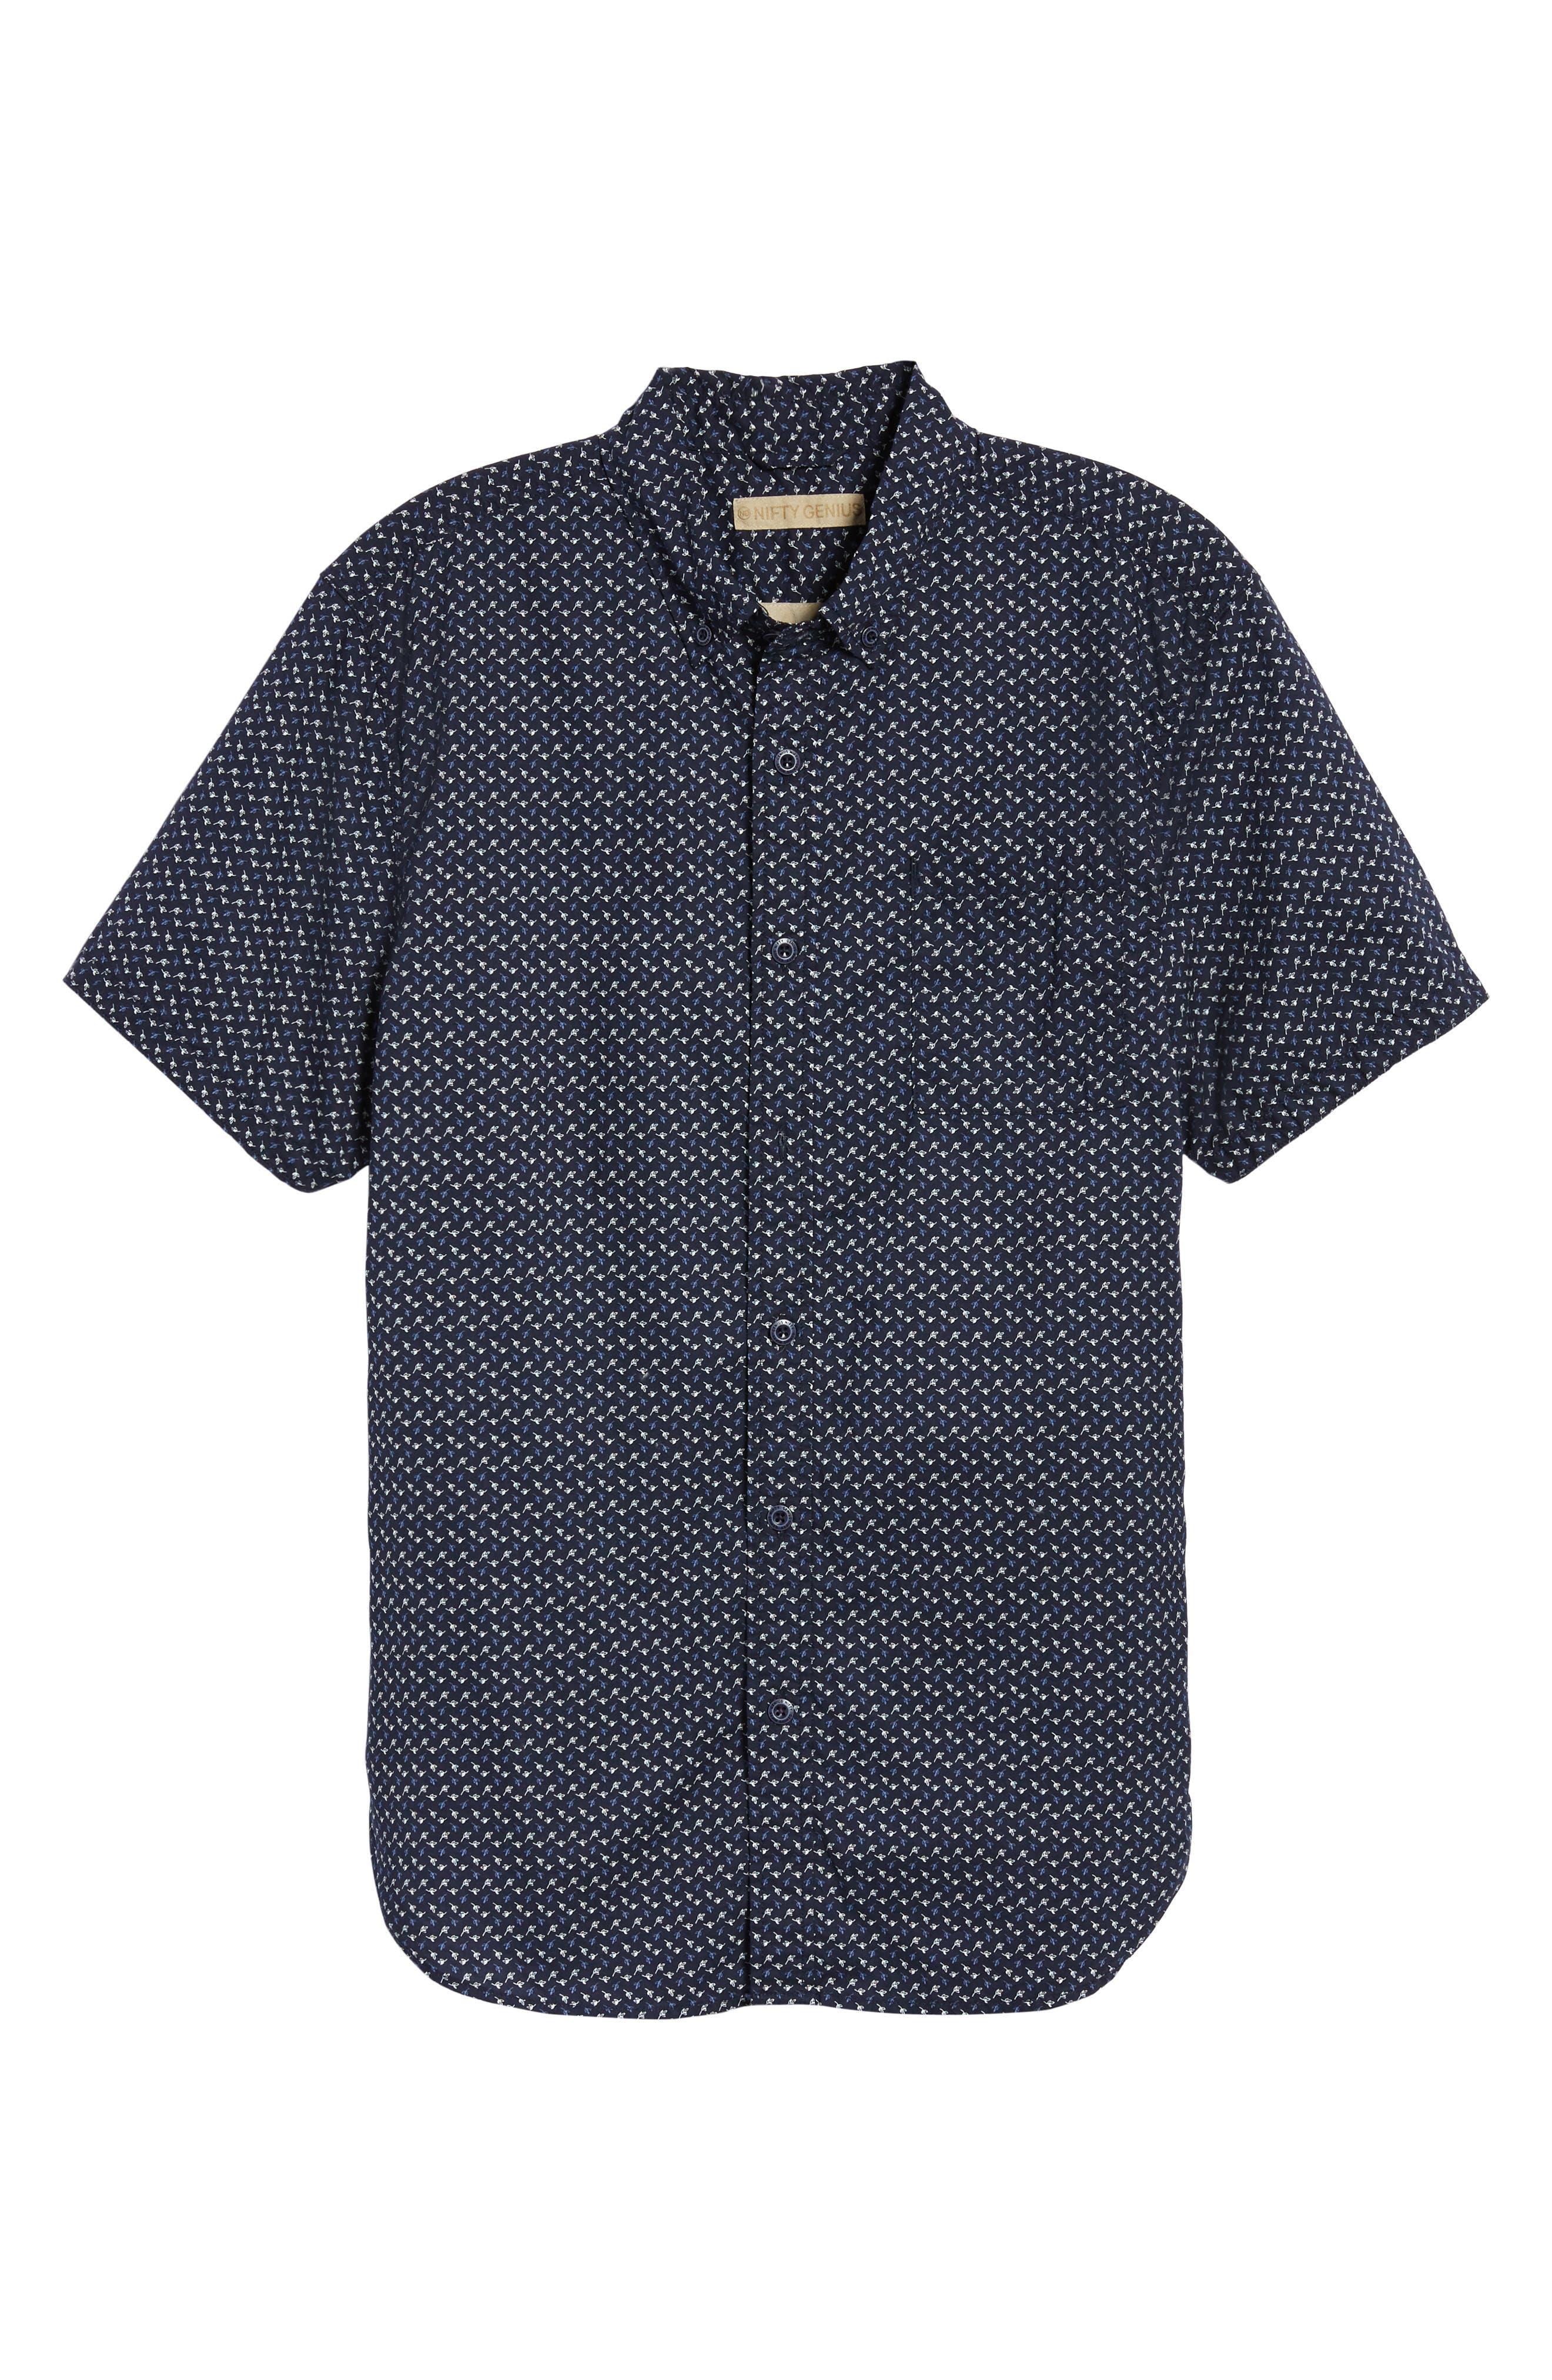 Truman Slim Fit Short Sleeve Sport Shirt,                             Alternate thumbnail 6, color,                             NAVY